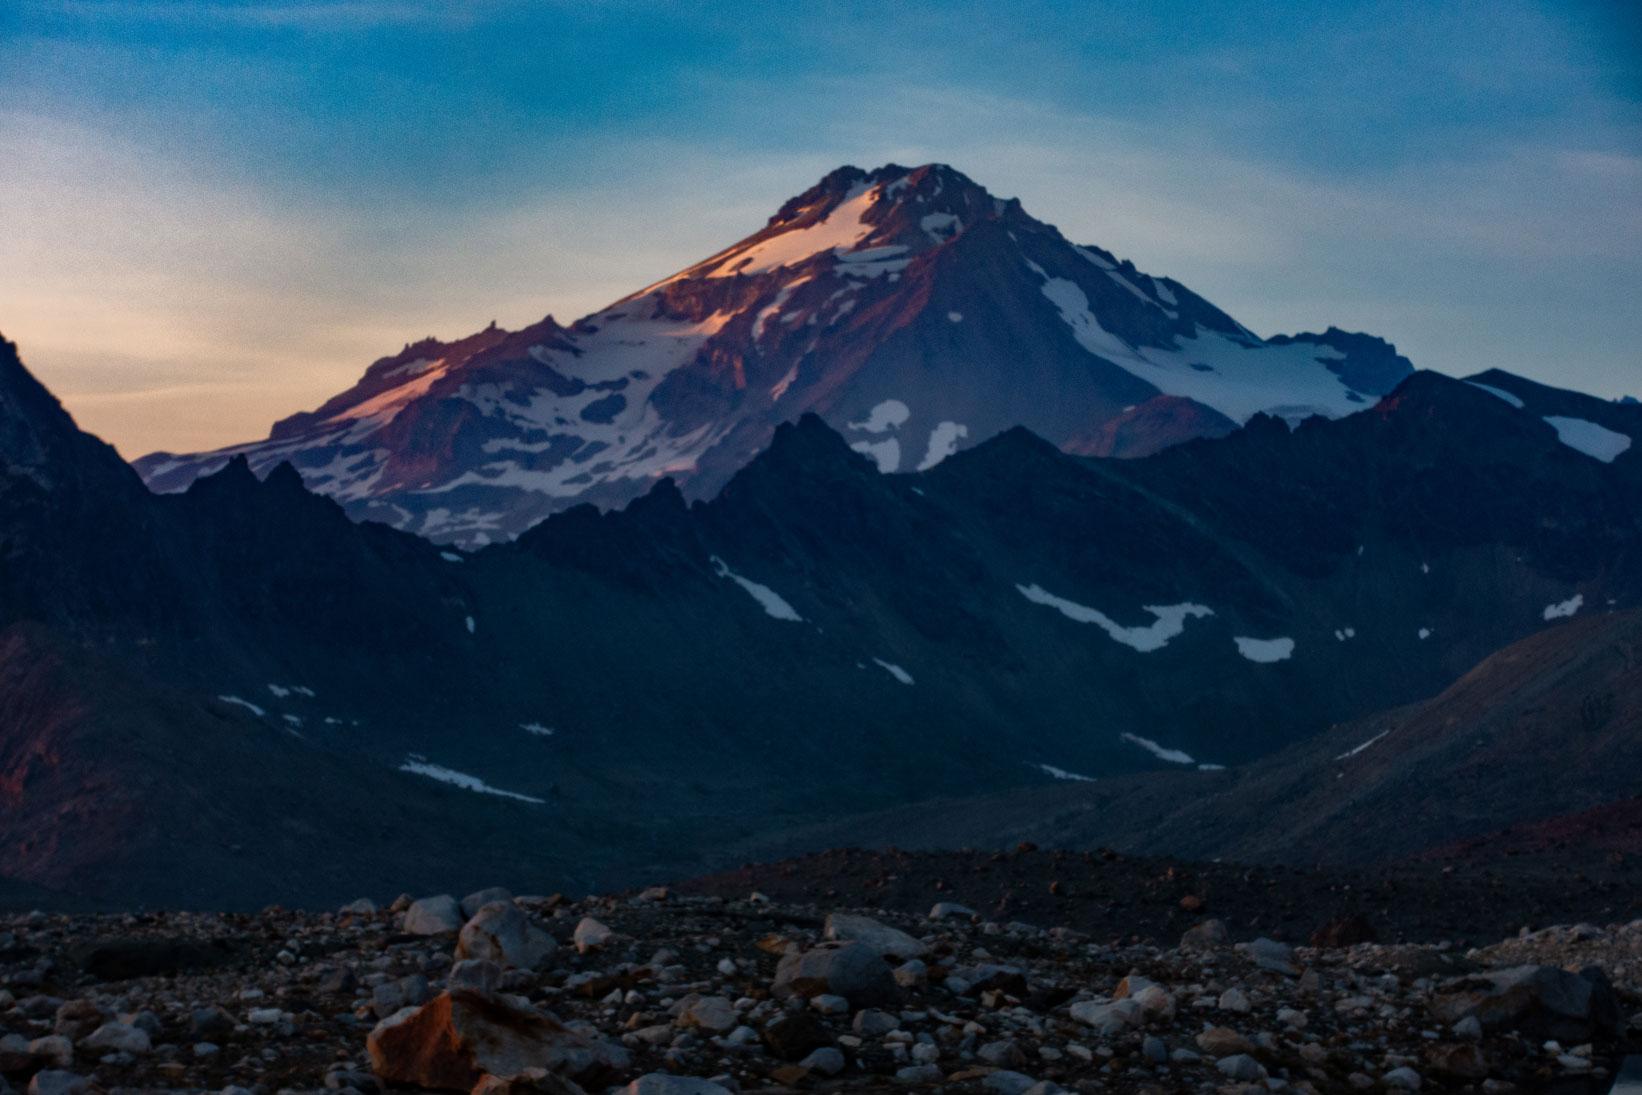 C:\Users\Russ\Desktop\Aug 2017 Glacier Peak with Pavel\JPG SEL\WEB\DSC01365.jpg